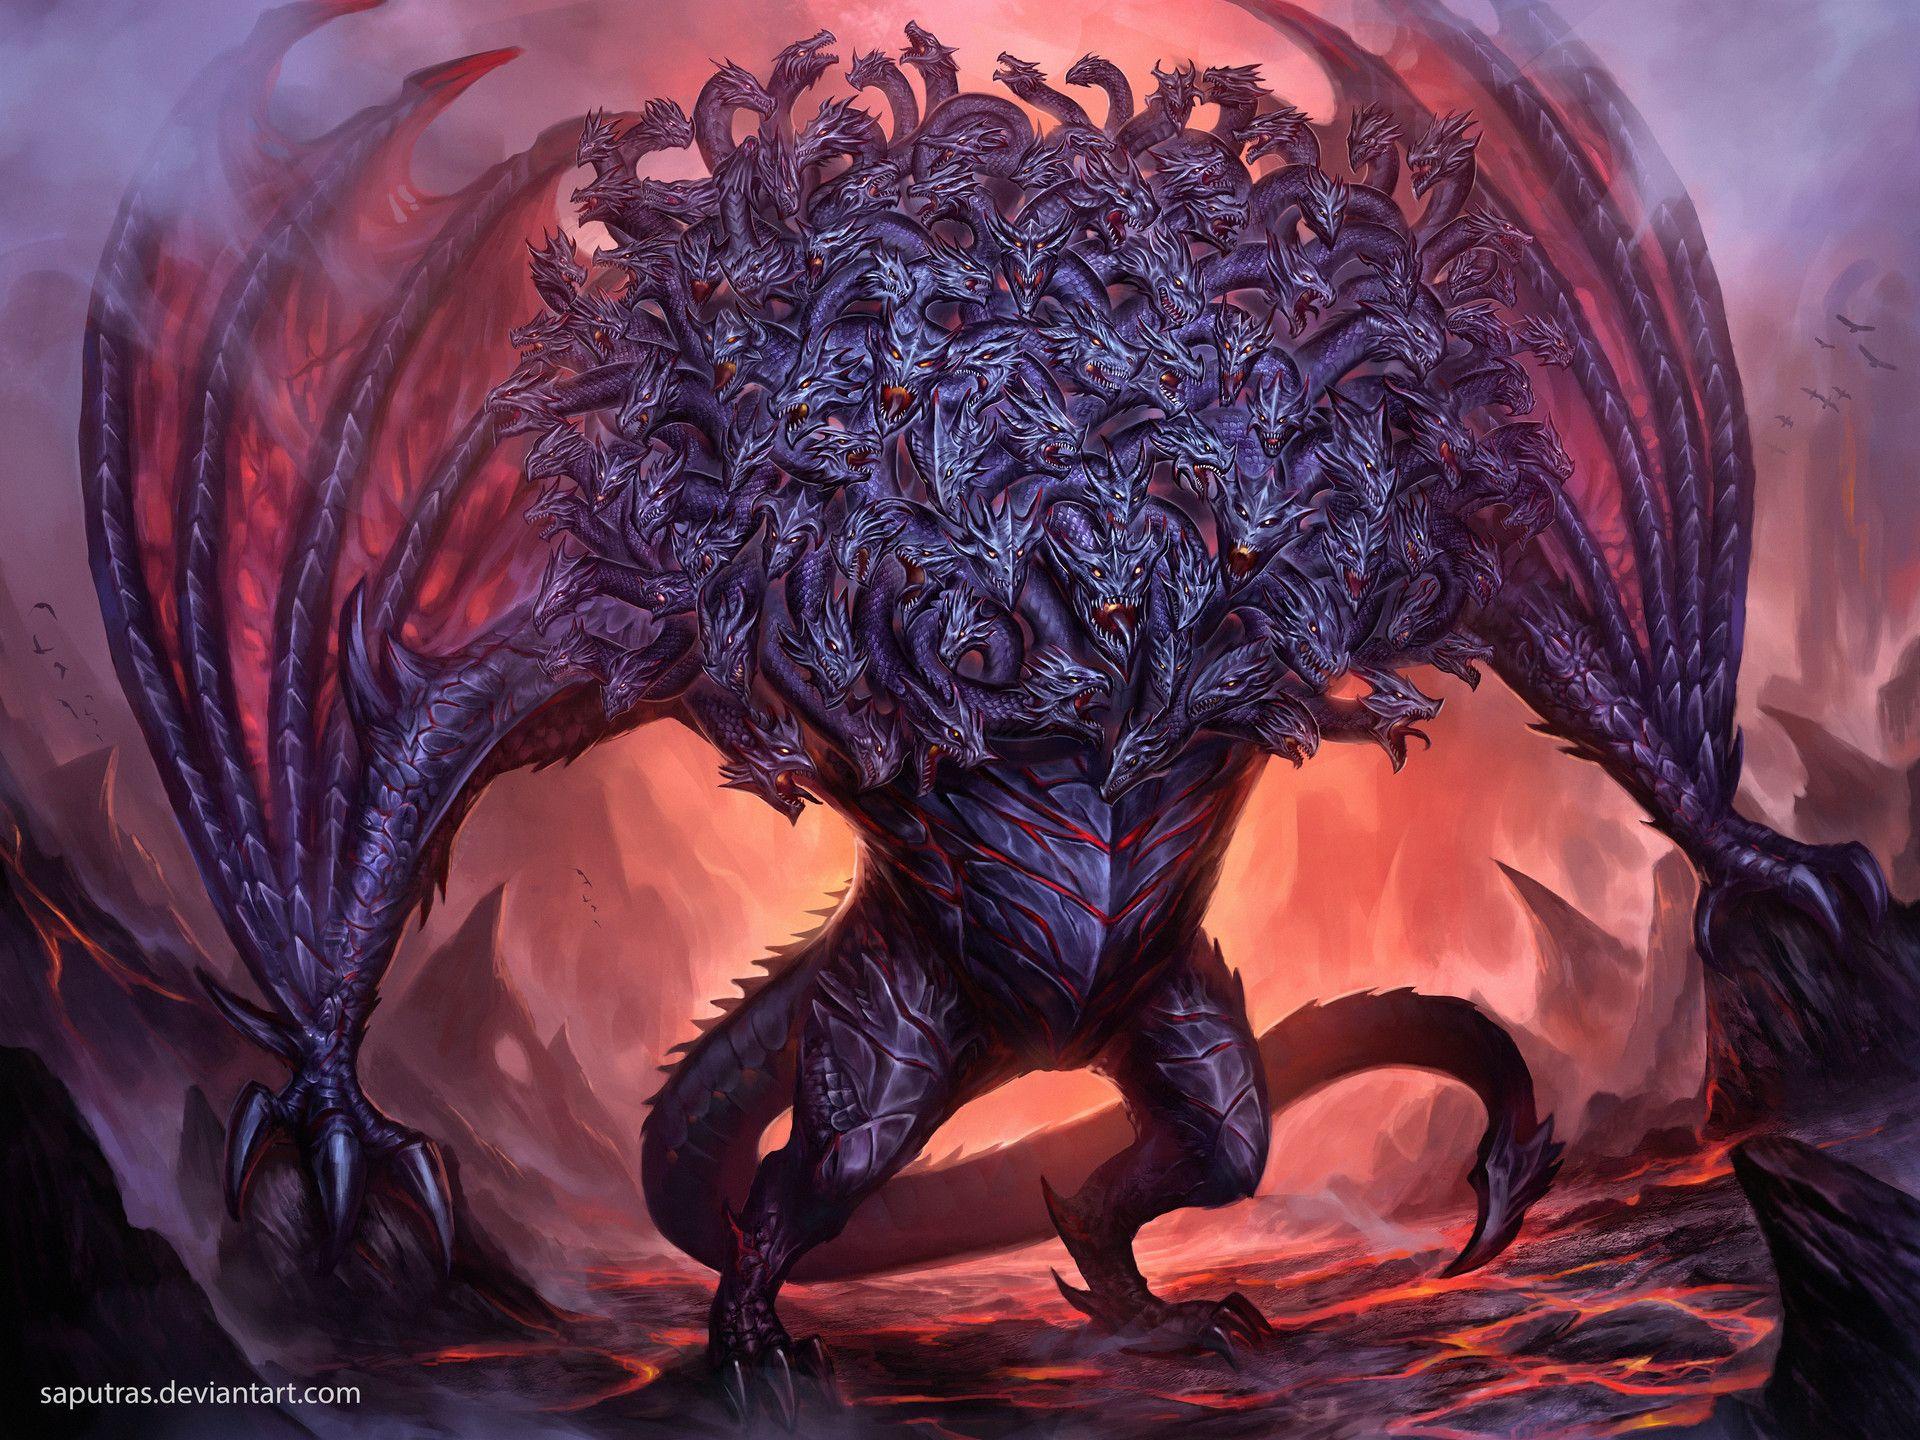 Dragon From Greek Mythology: Ladon,The 100 Headed Dragon, Yosi Saputras